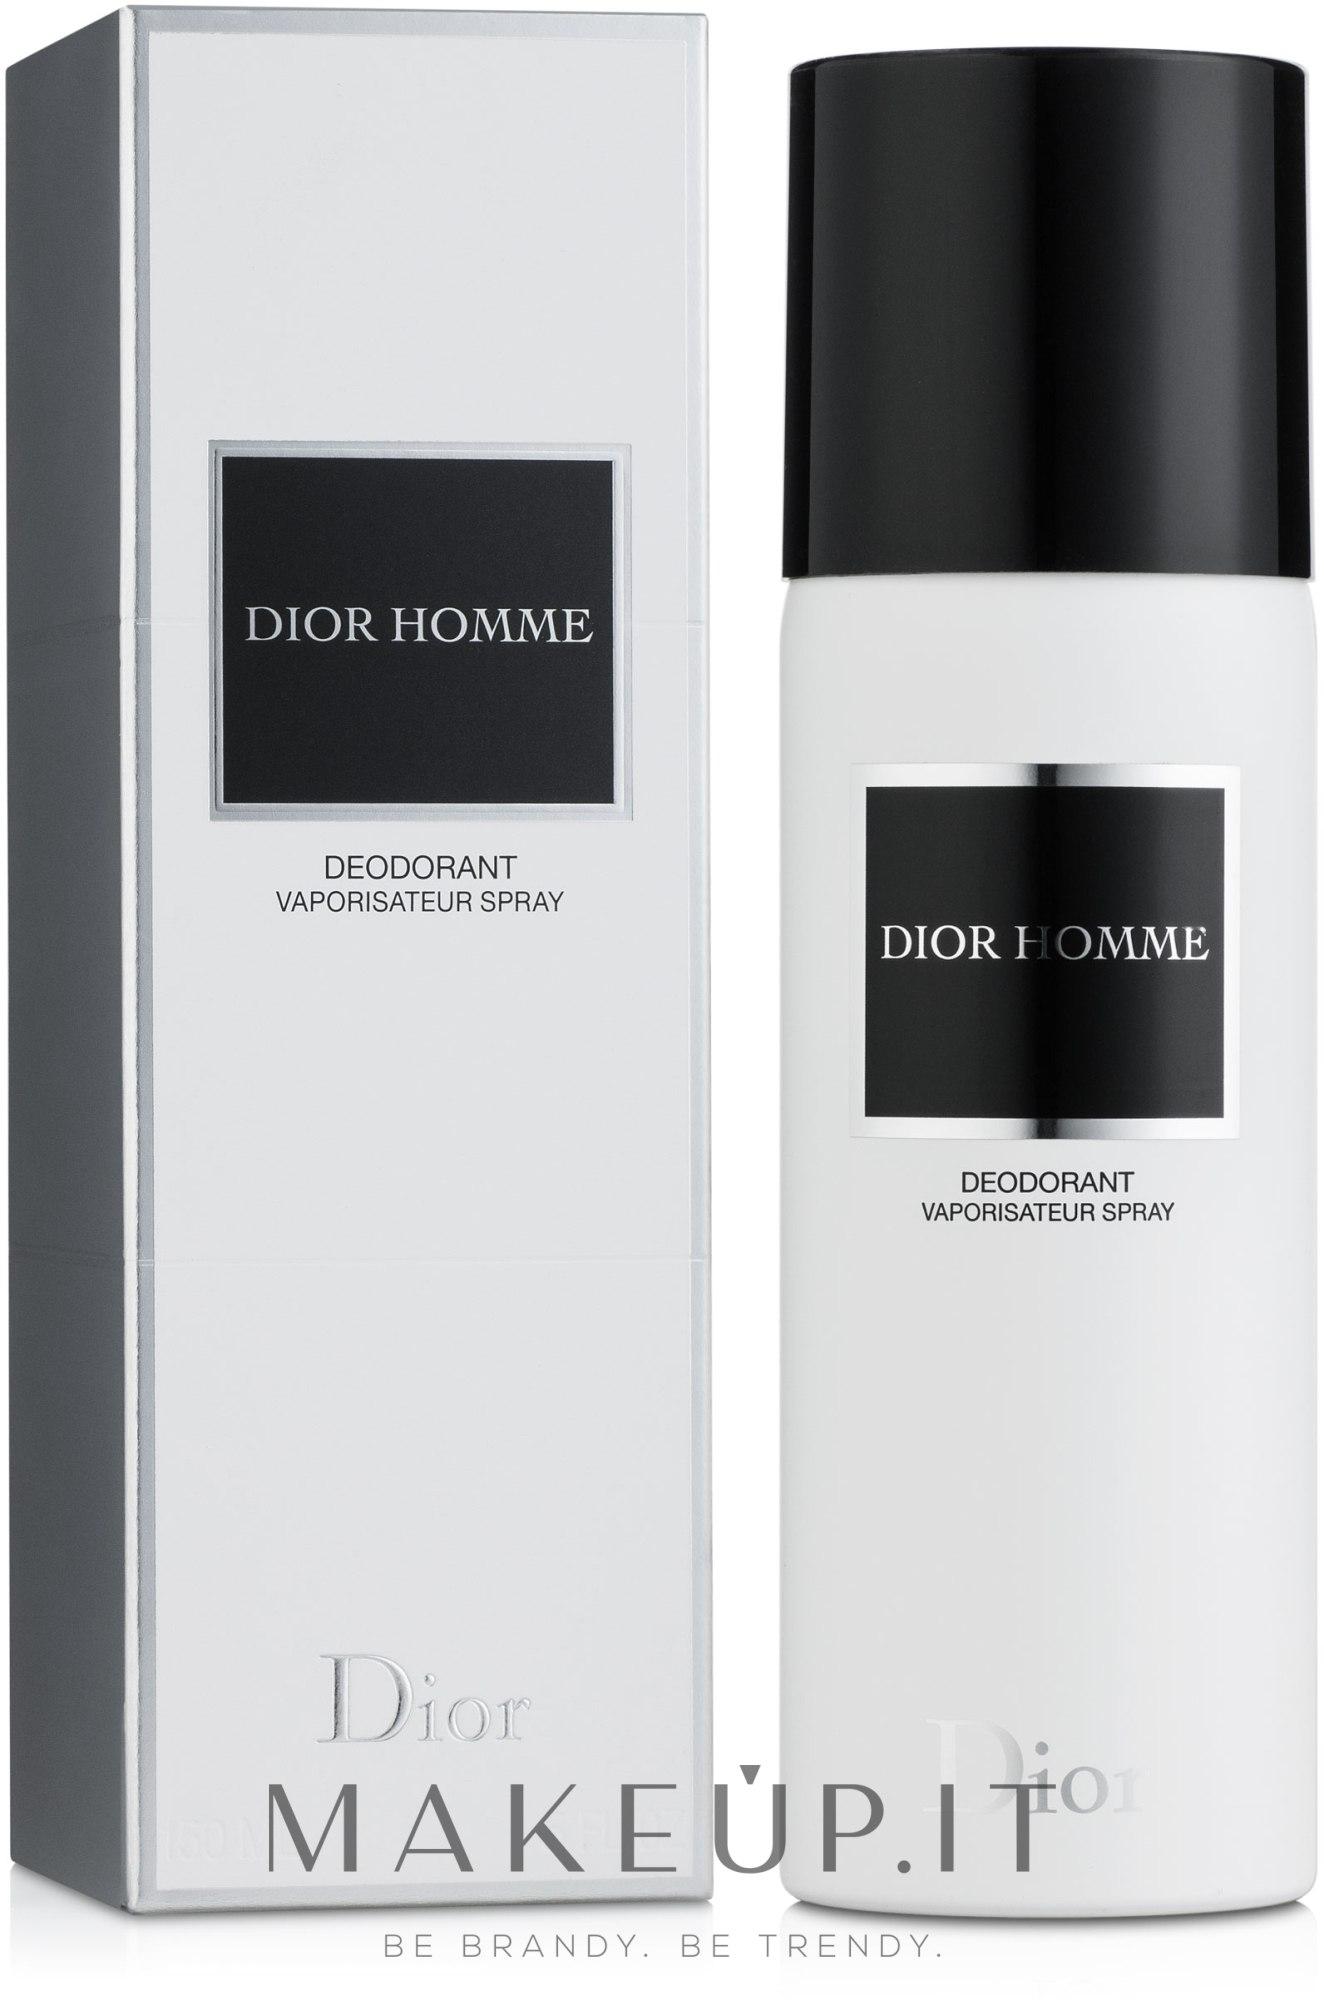 Dior Homme - Deodorante — foto 150 ml